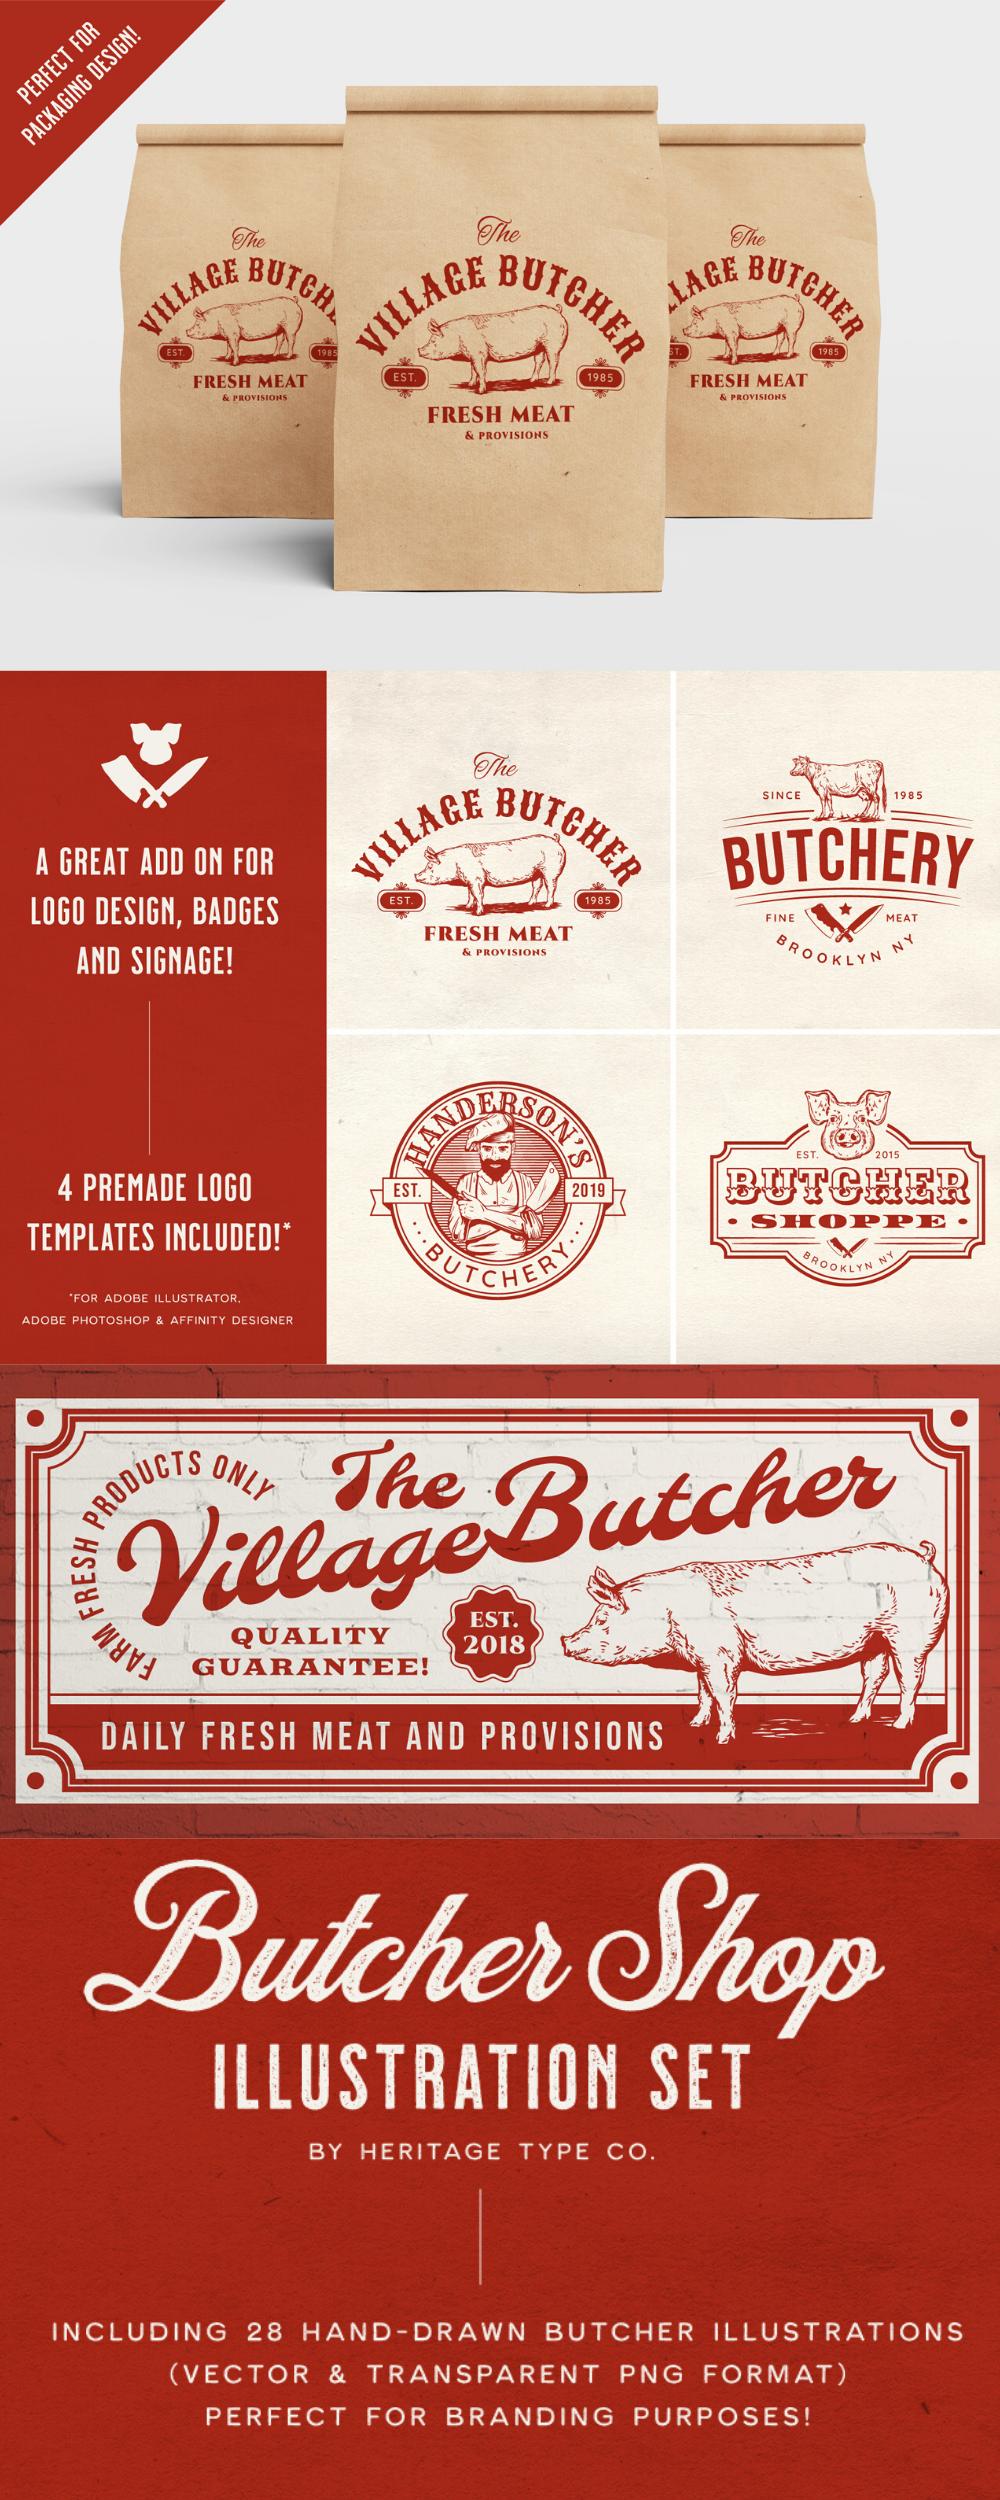 Butcher Shop Vector Illustration Set Metzgerei Metzgermesser Web Design